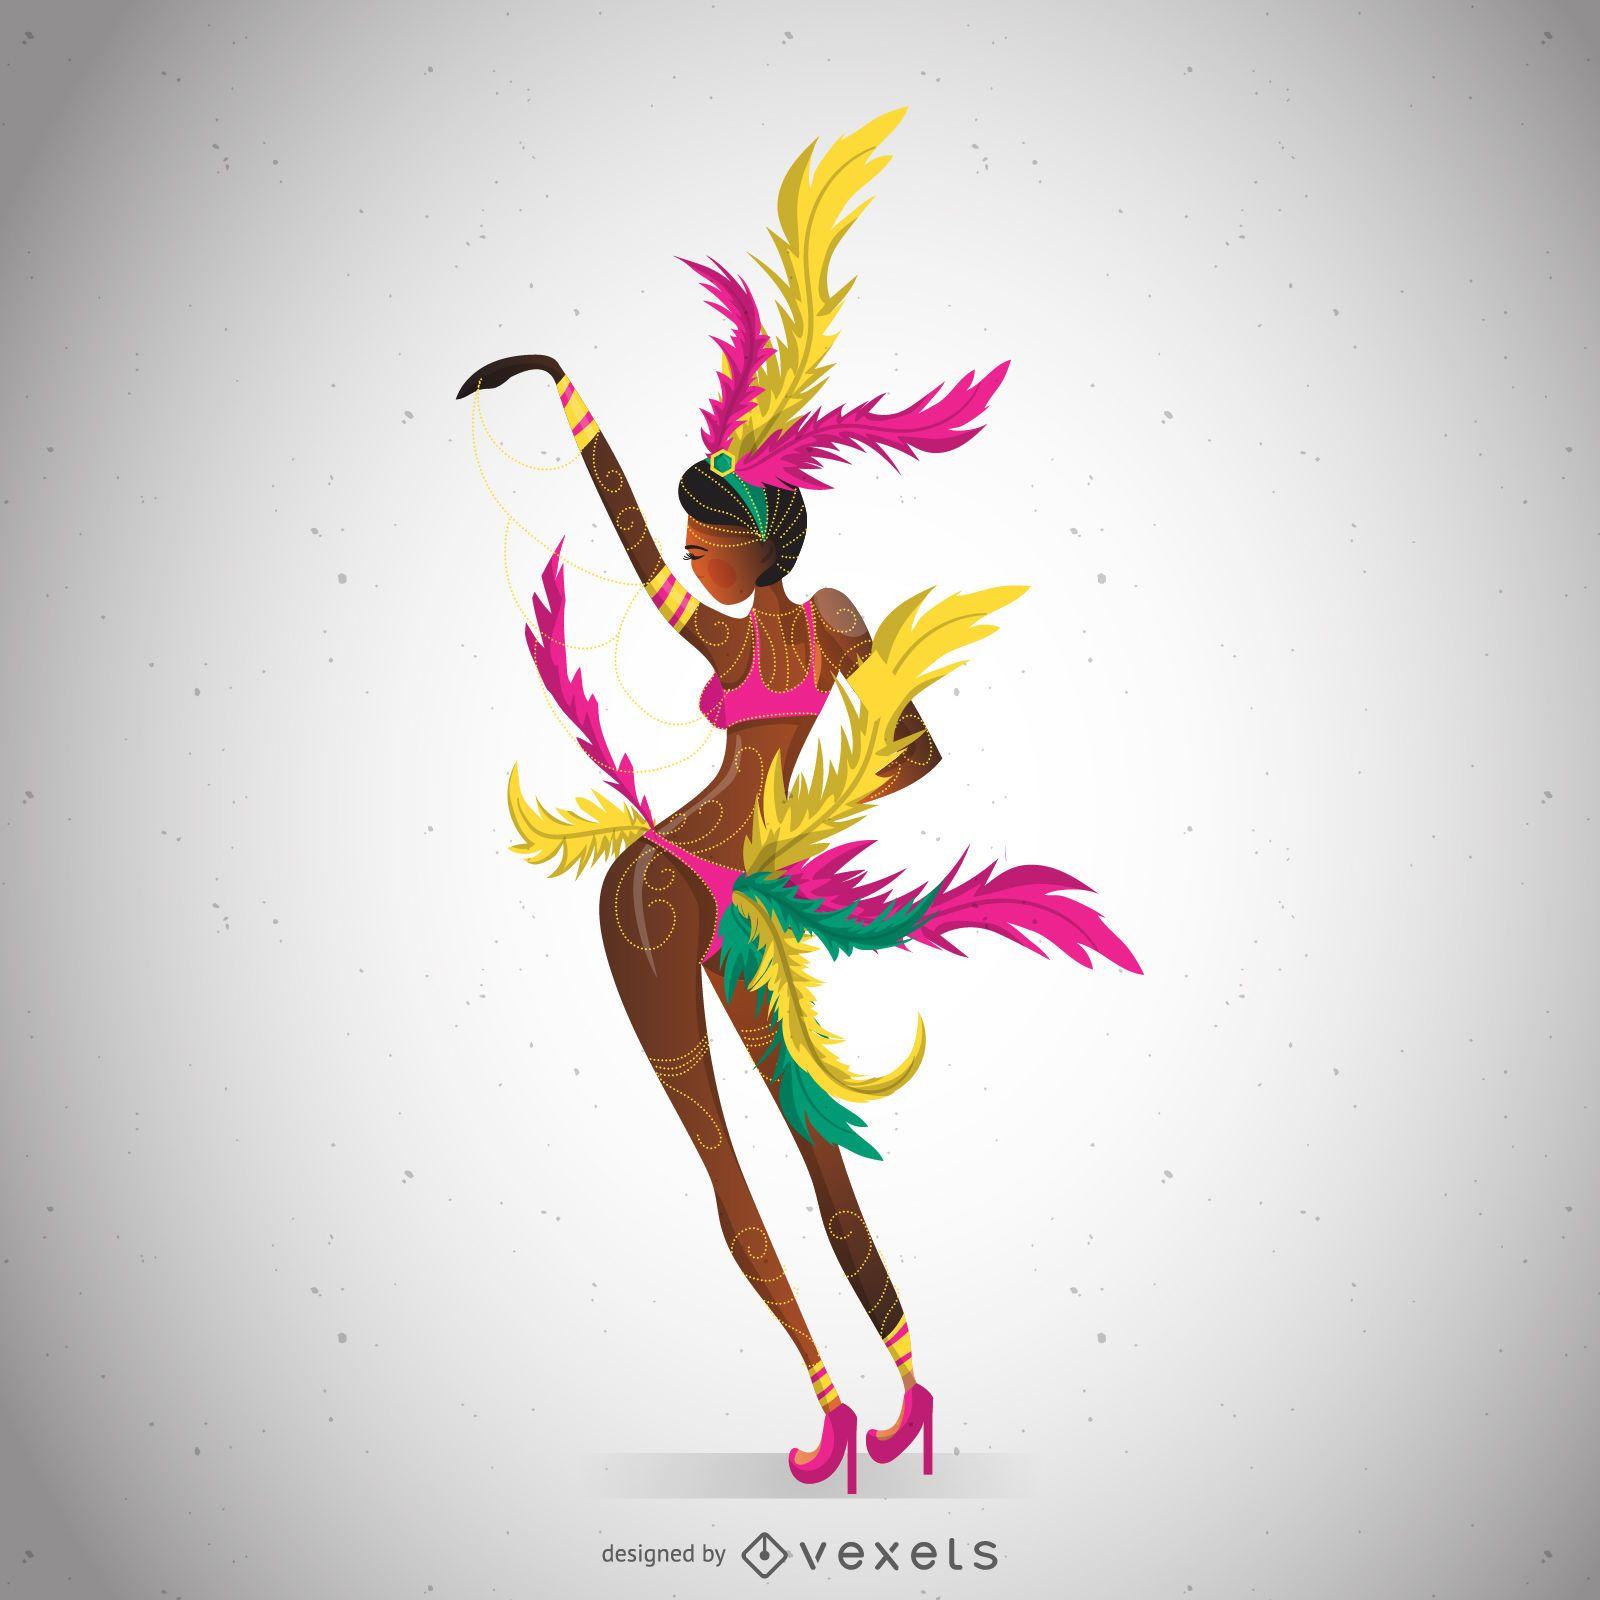 Illustrated carnival dancer posing